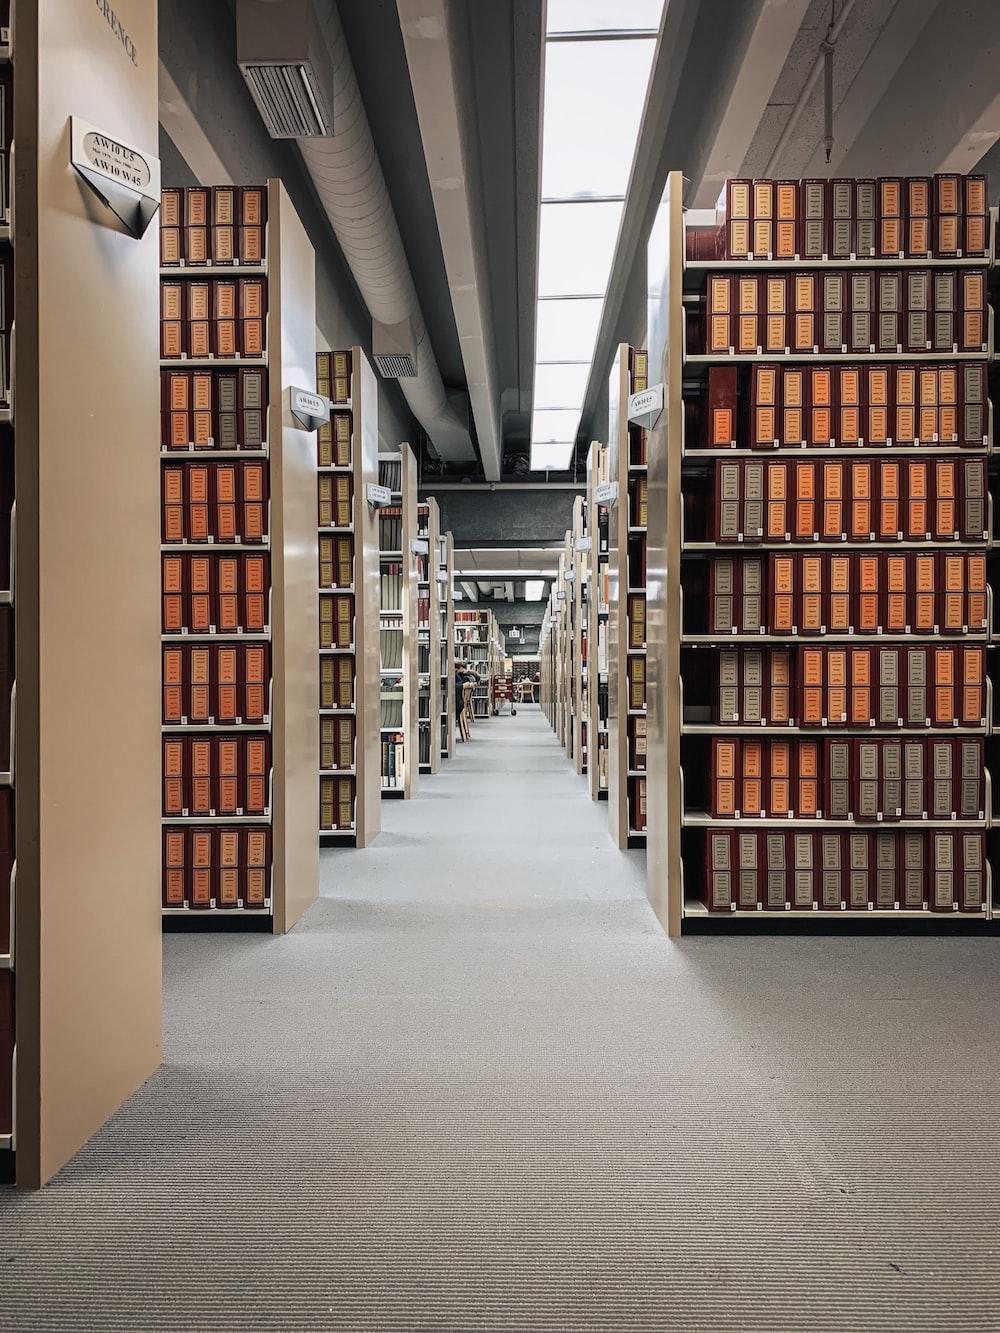 brown wooden book shelves on gray concrete floor